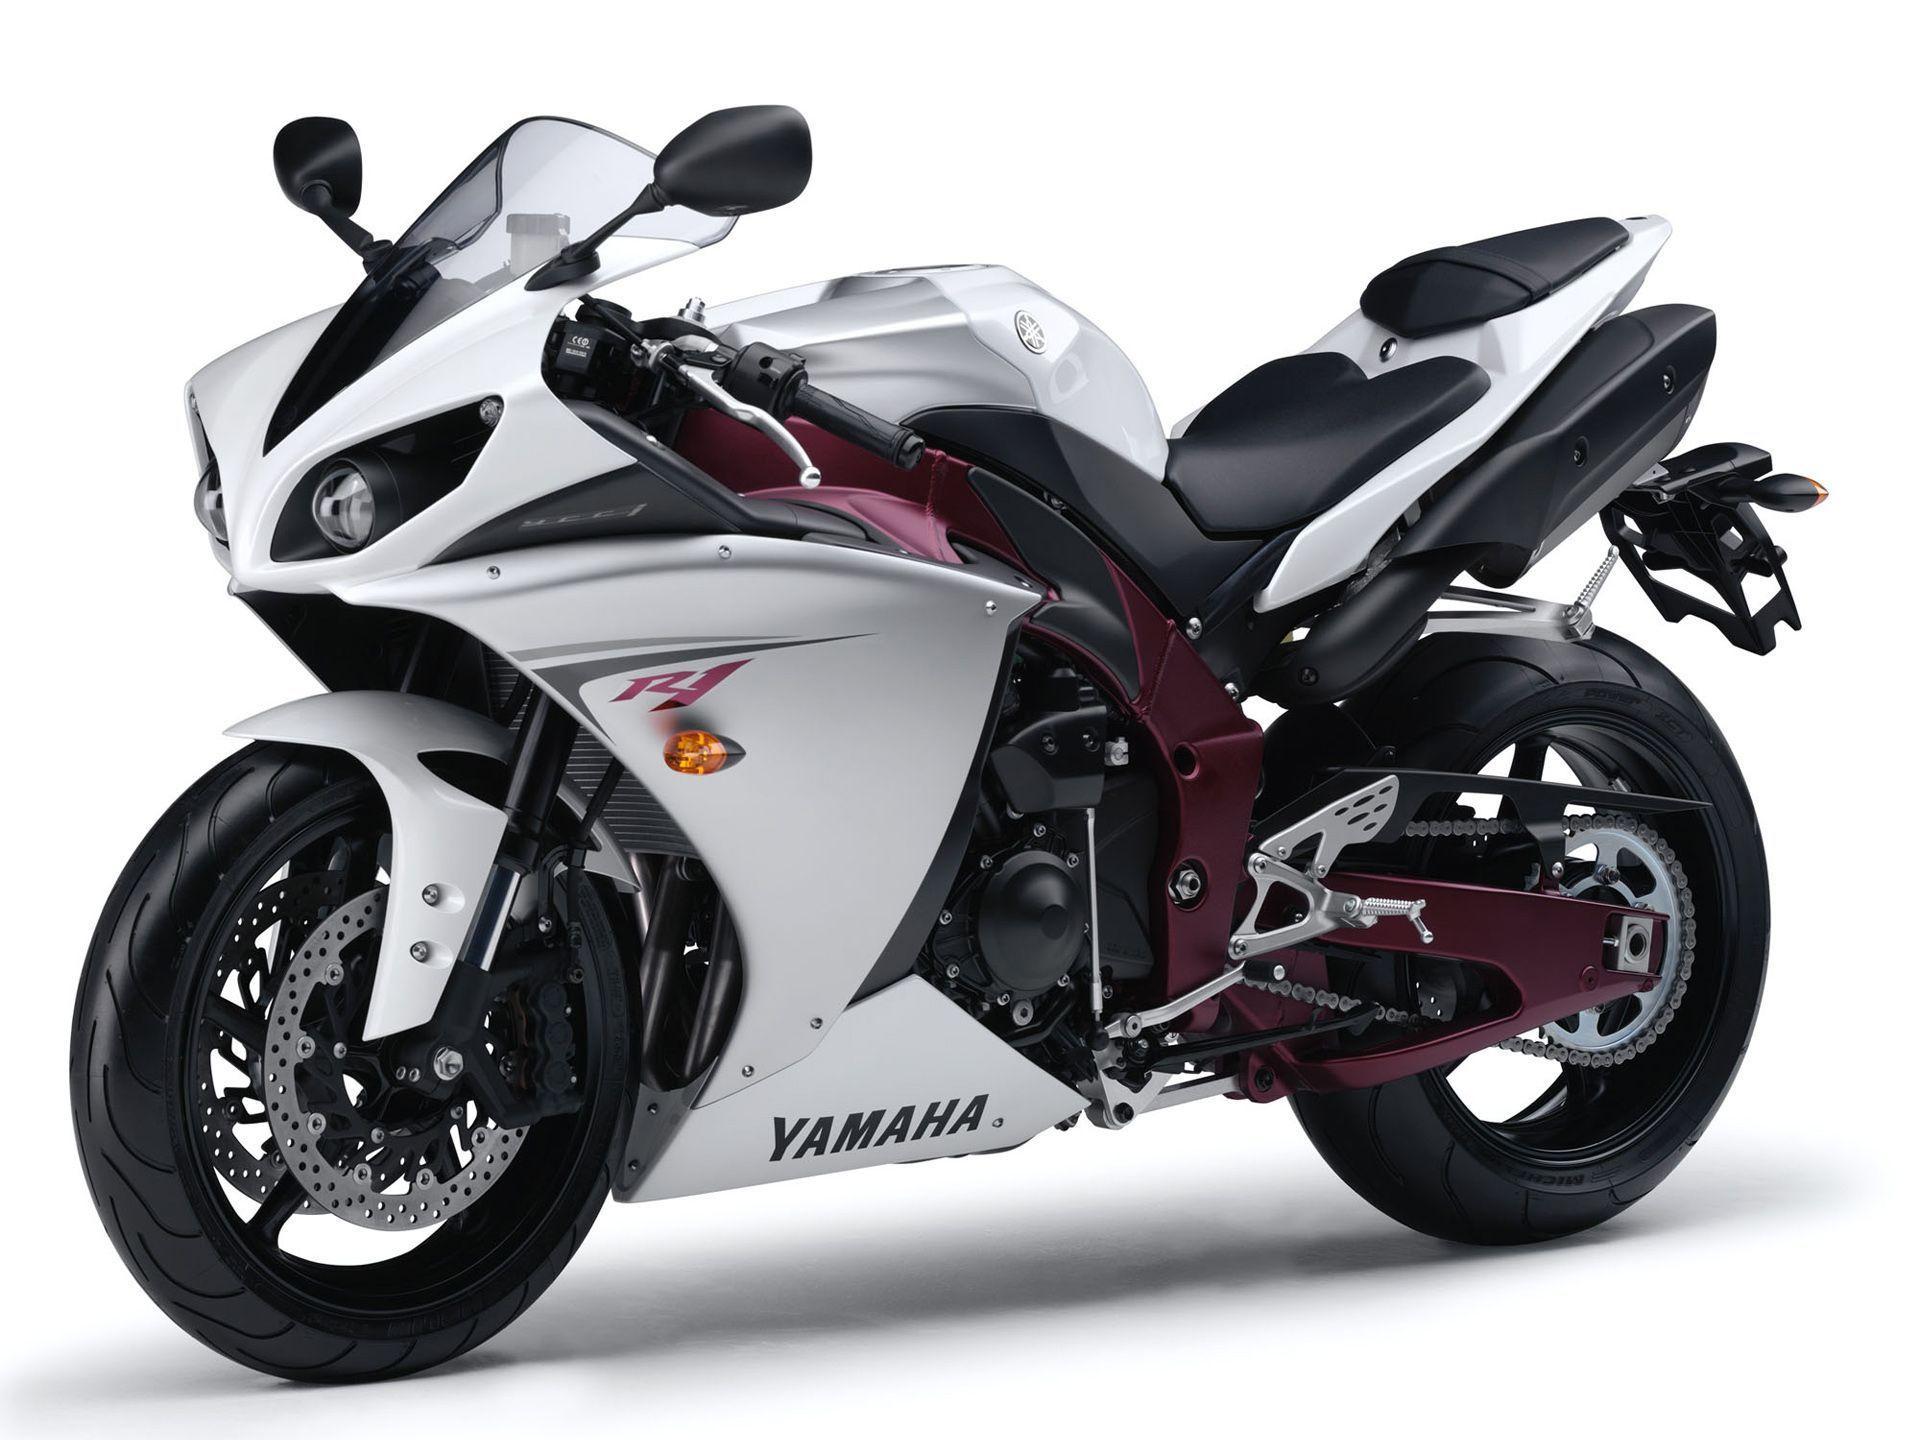 Hd wallpaper yamaha bike - White Yamaha Yzf R1 Wallpapers Hd Wallpapers 360